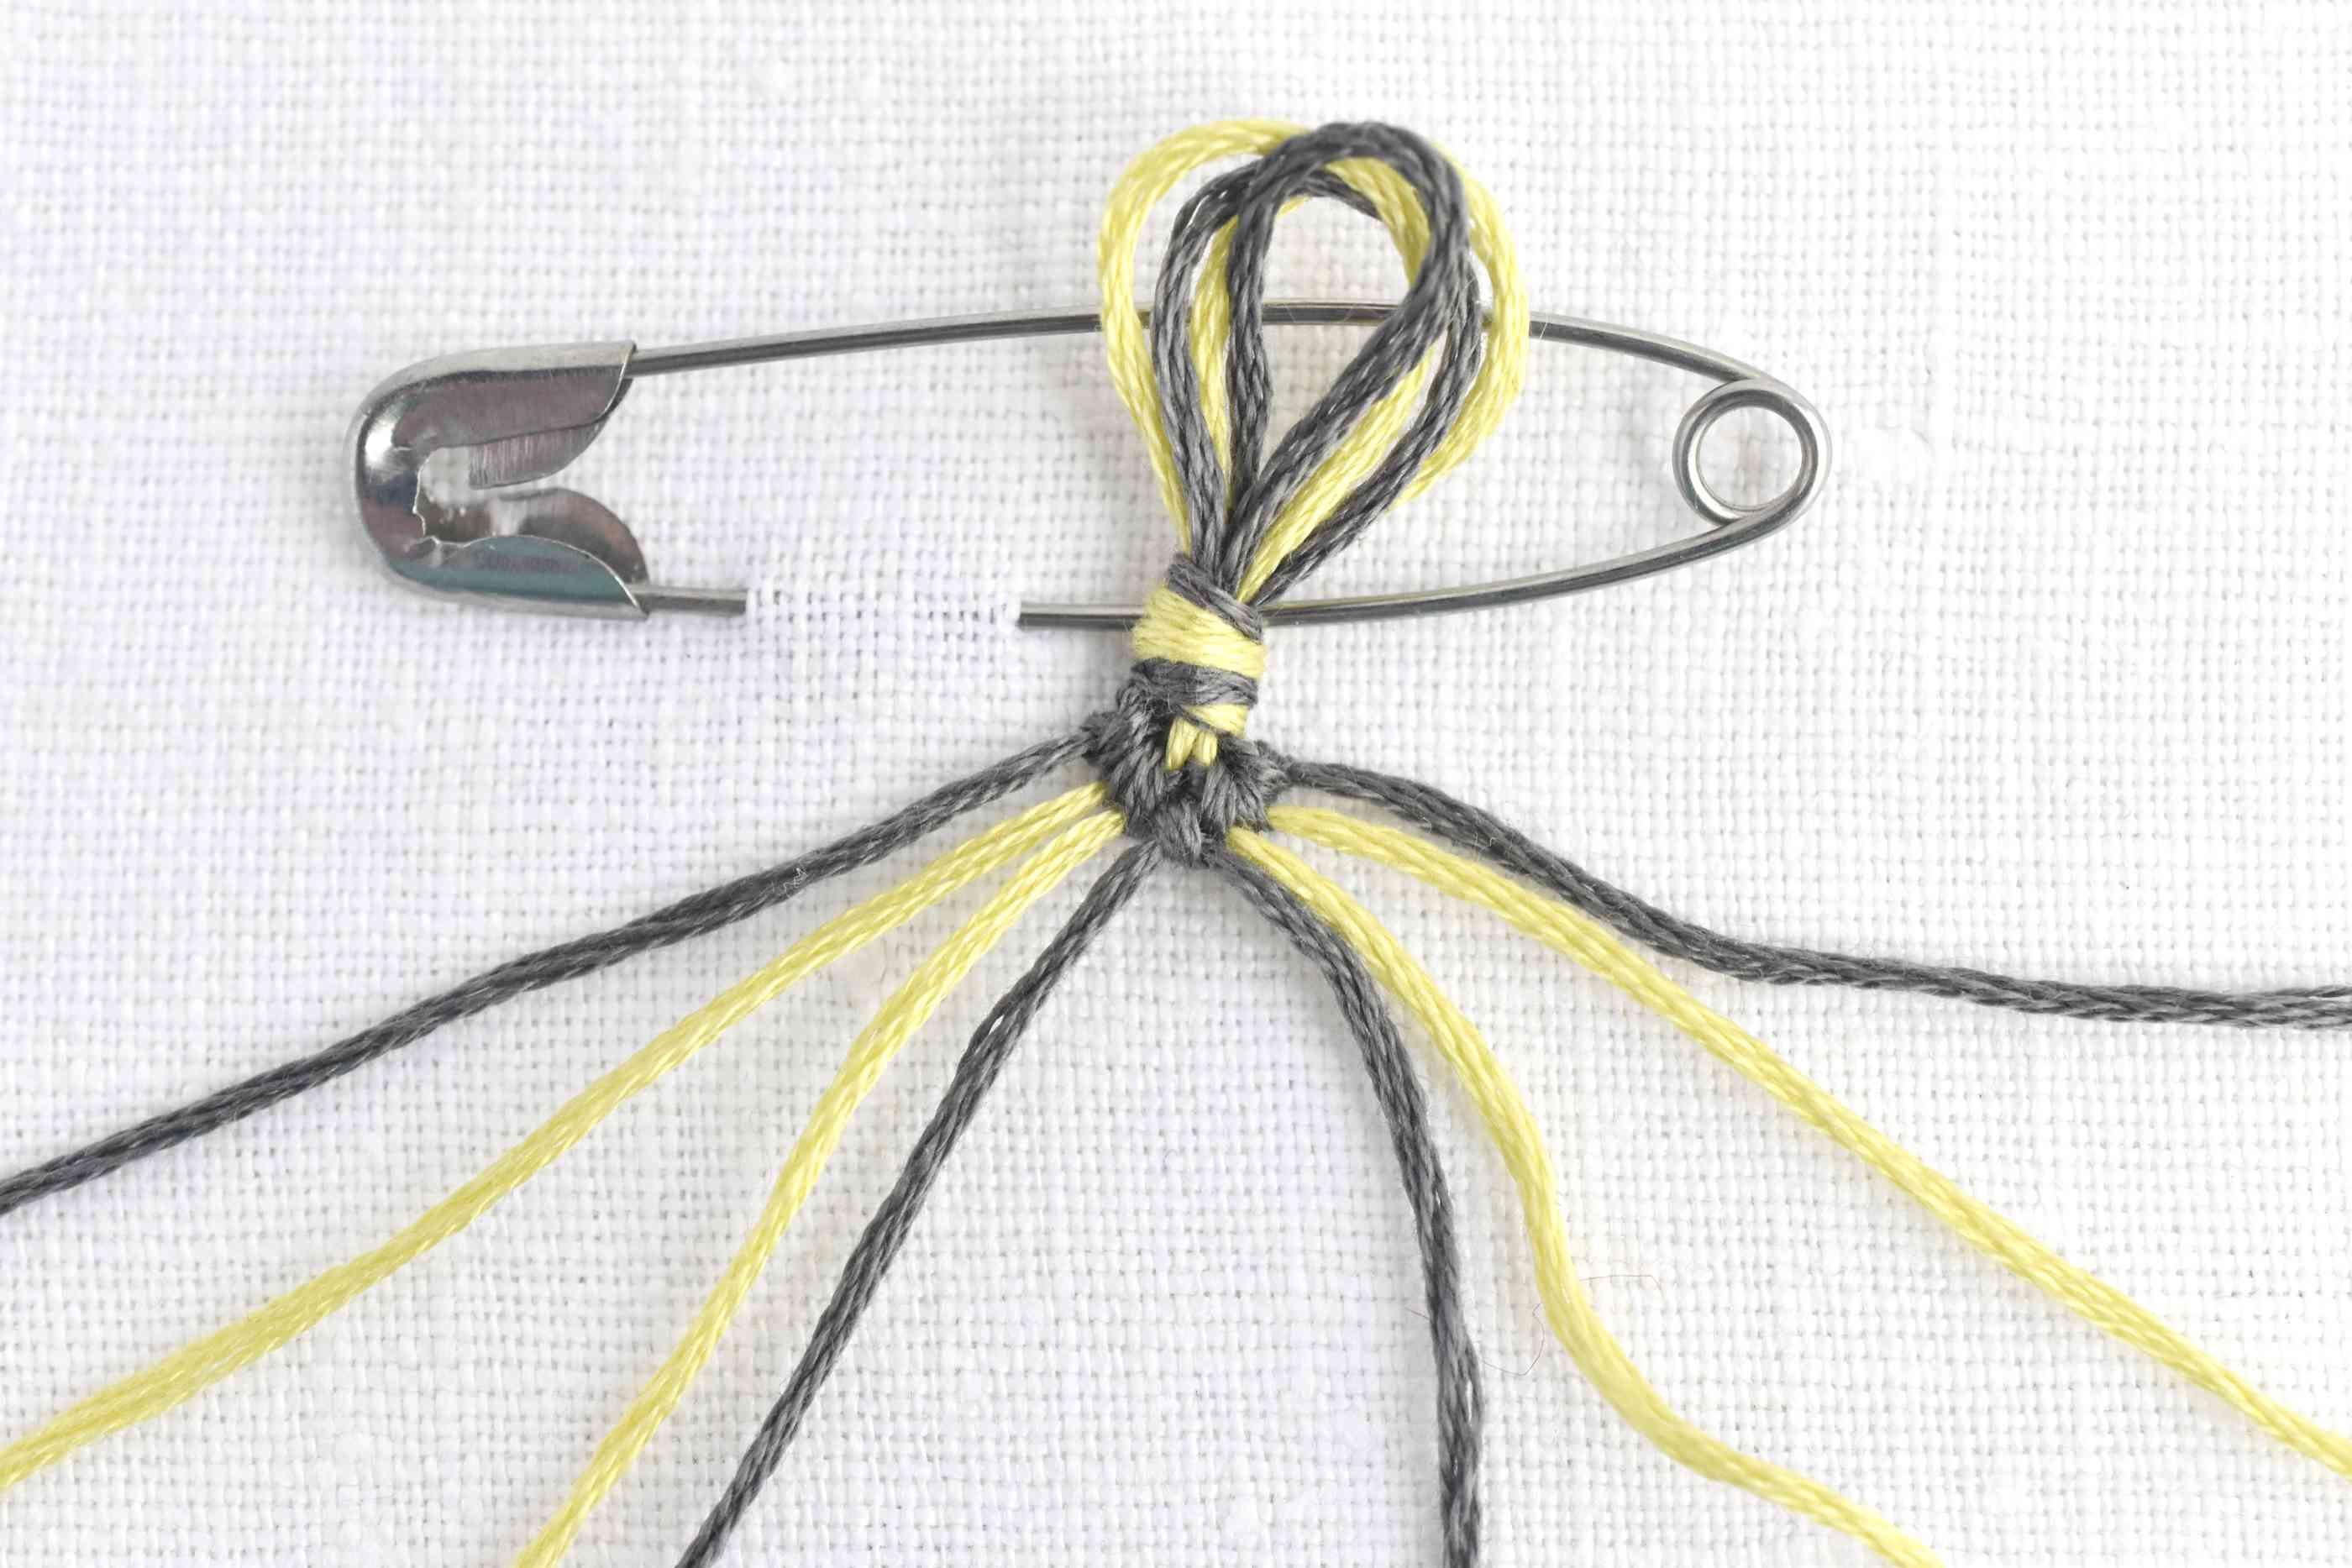 One row of knots on a chevron friendship bracelet